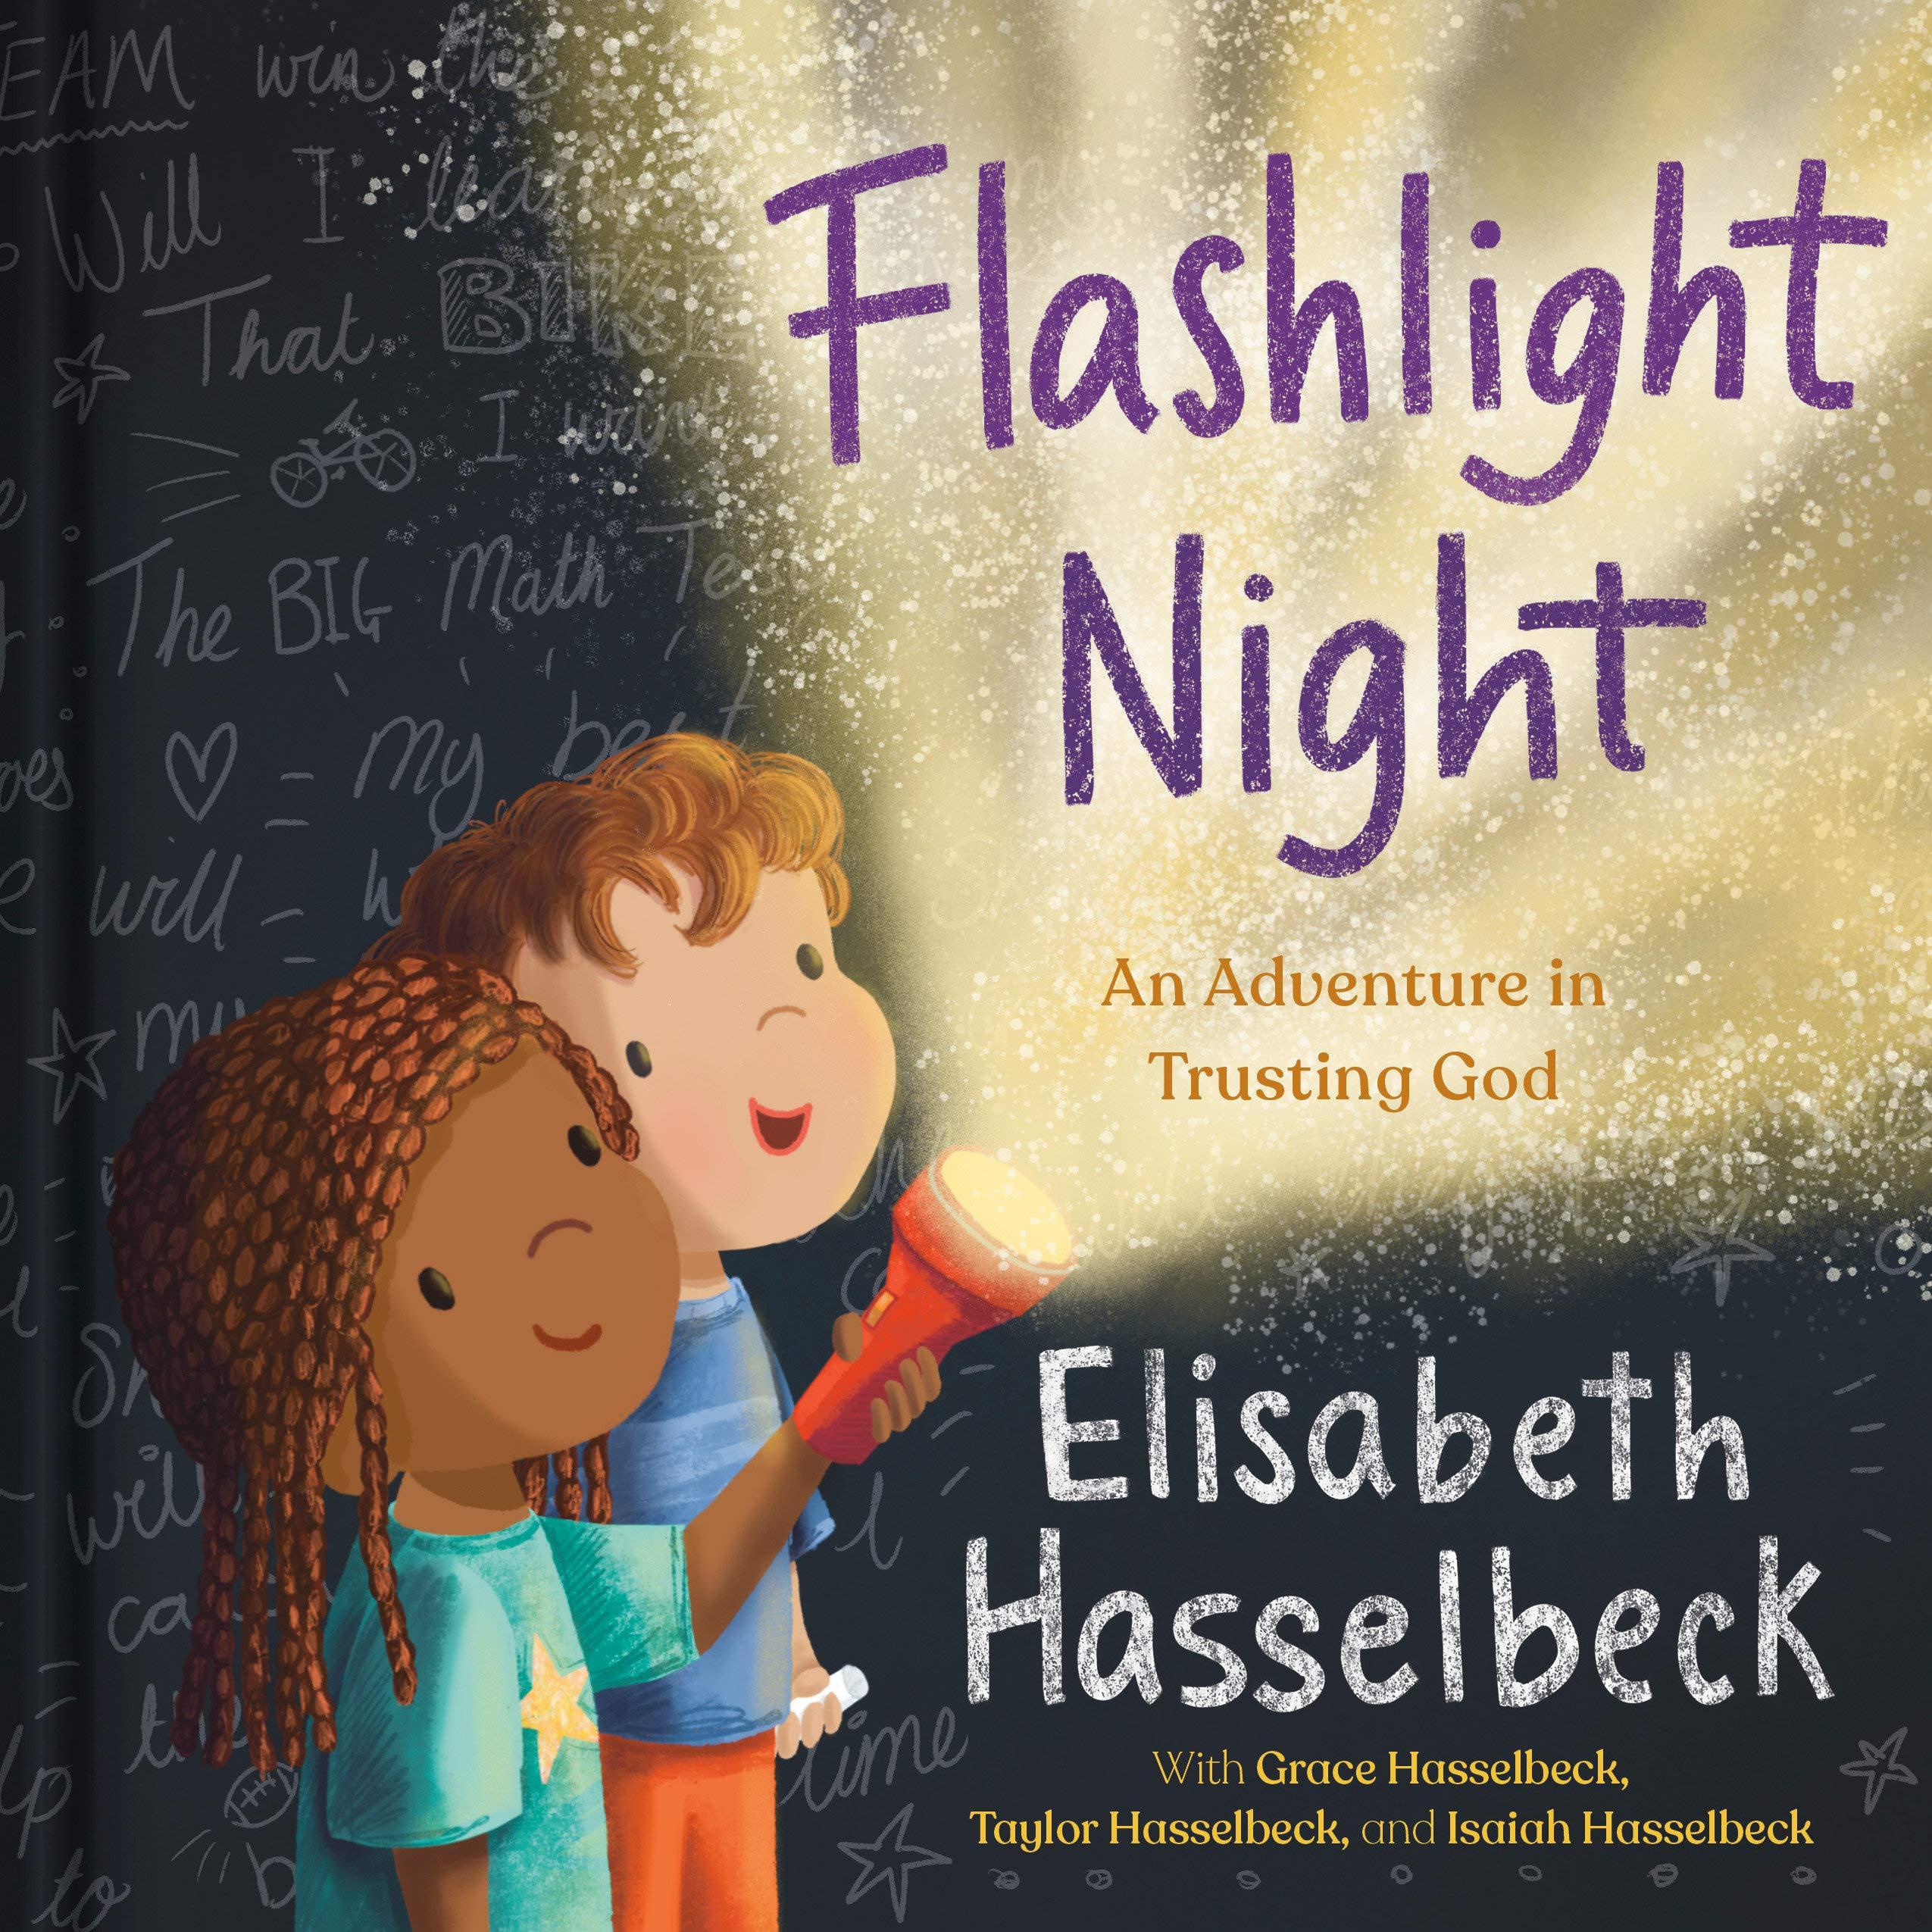 Flashlight Night: An Adventure in Trusting God WeeklyReviewer